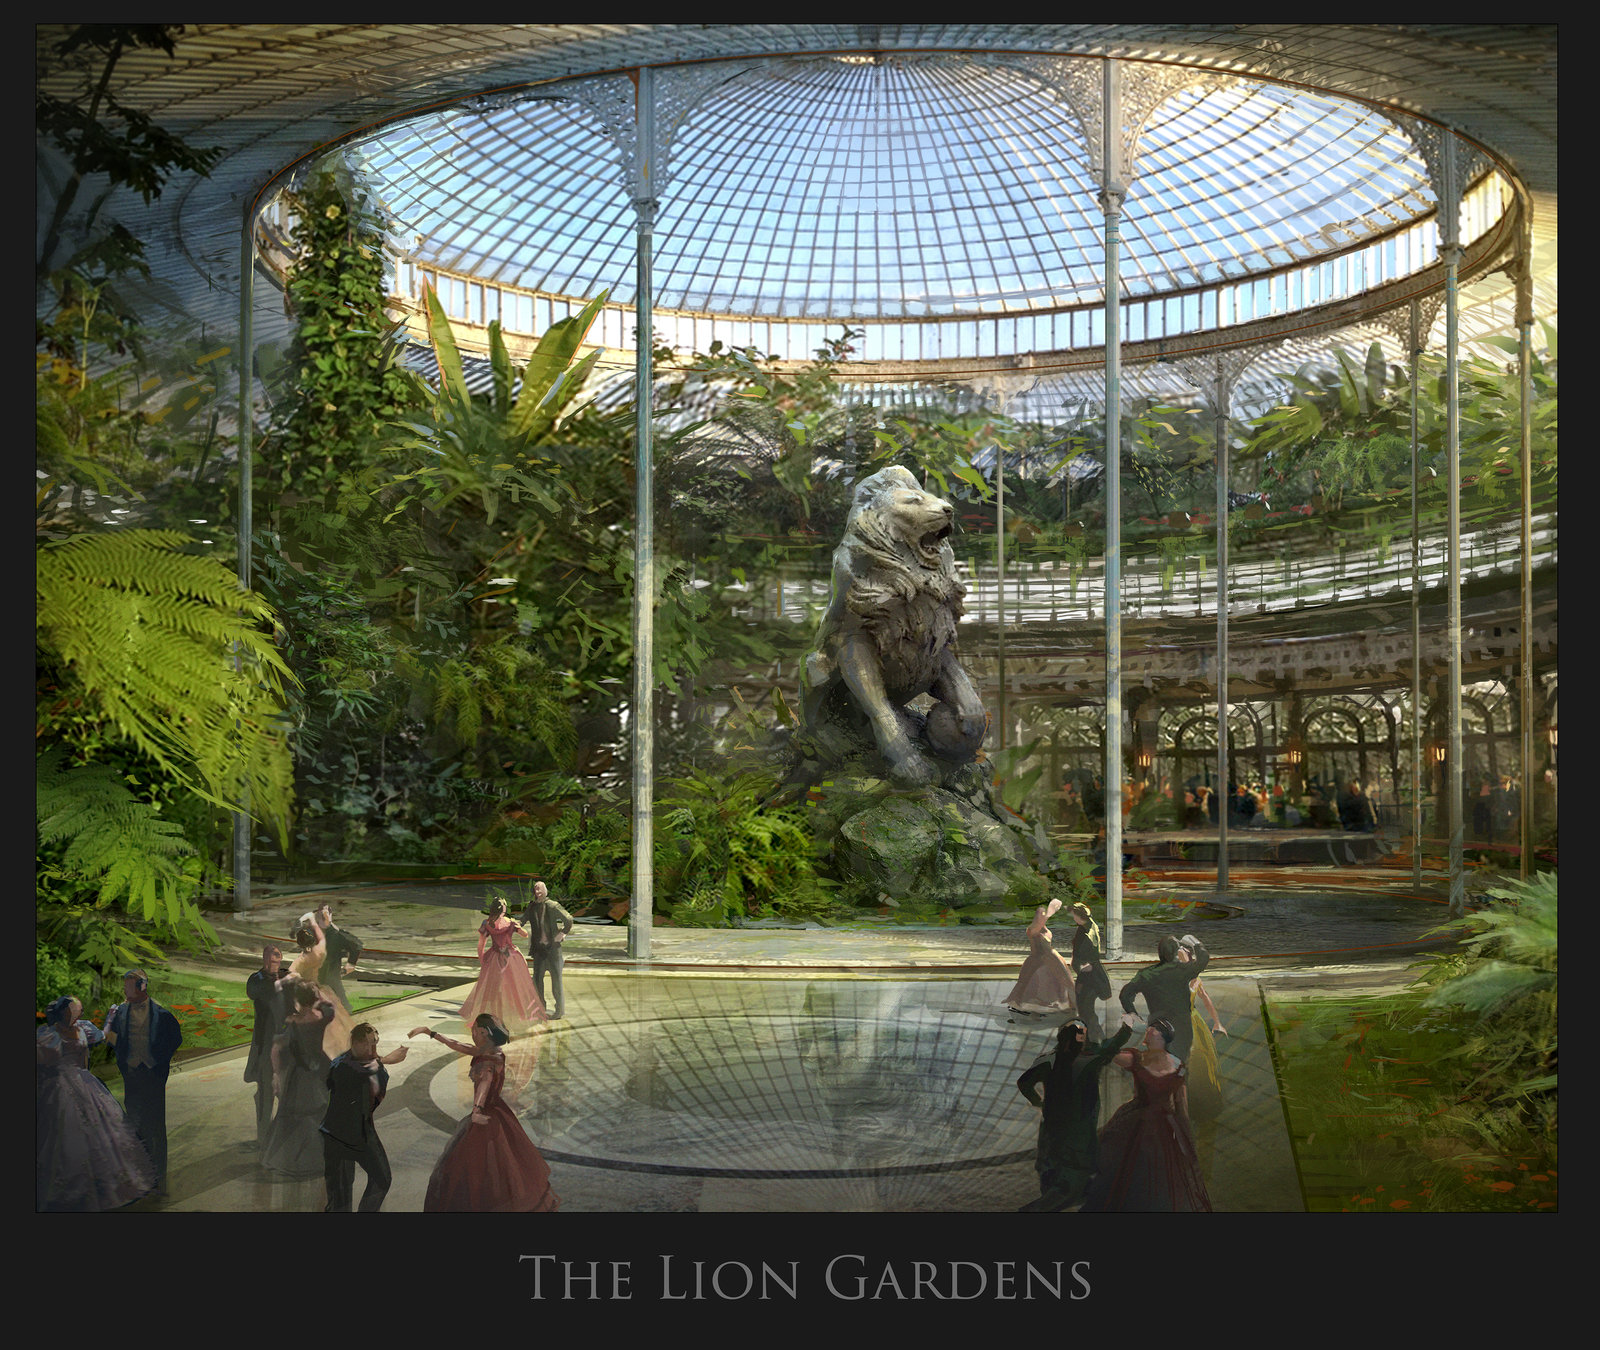 The Lion Gardens